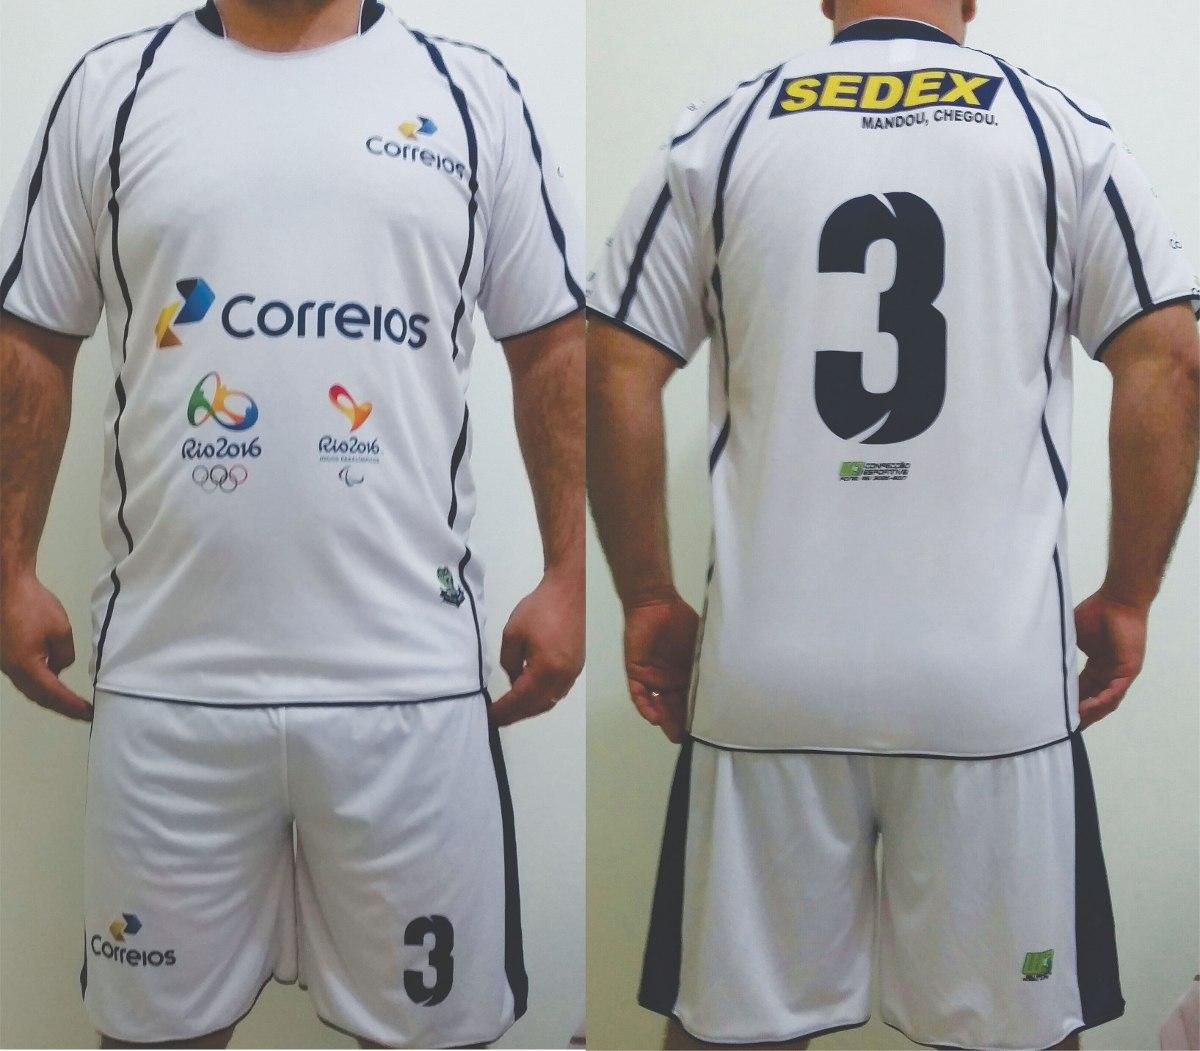 159da809c6 uniforme esportivo personalizado futebol chacara futsa 11cnj. Carregando  zoom.